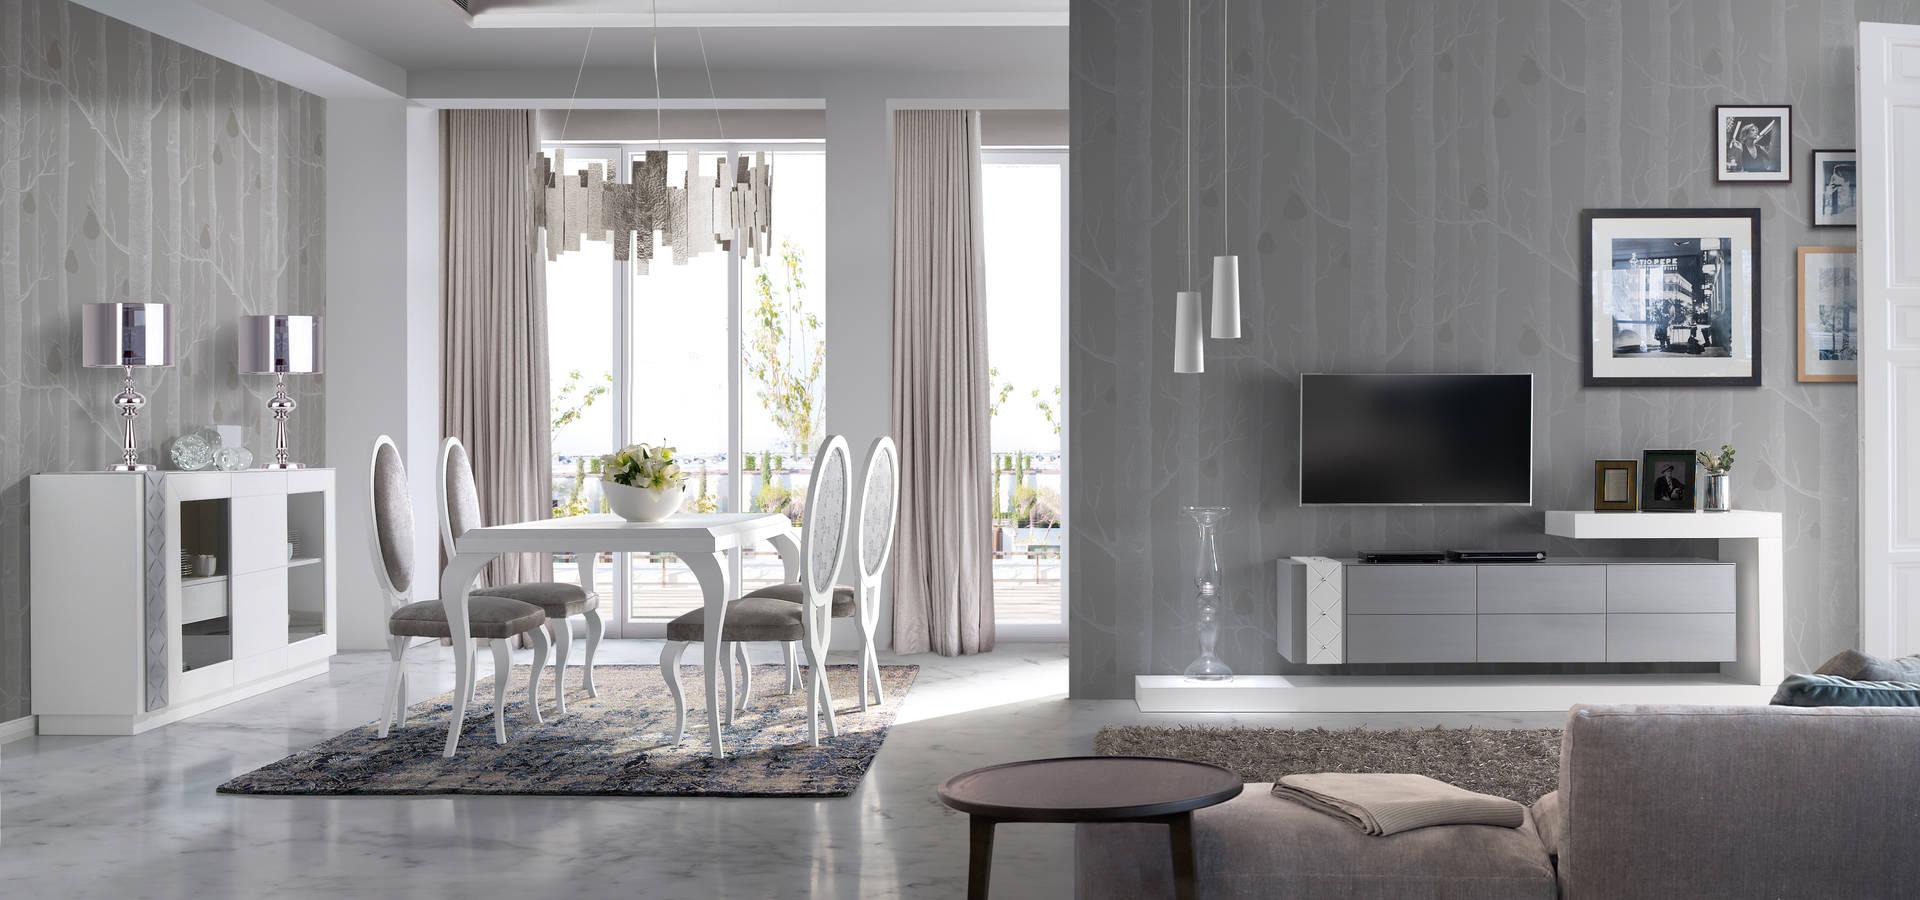 Muebles Huertas - Huertas Furniture Muebles Y Accesorios En Lucena Homify[mjhdah]https://deycor.com/app/uploads/2017/05/hukam-resumen-paris-pagina-01.jpg